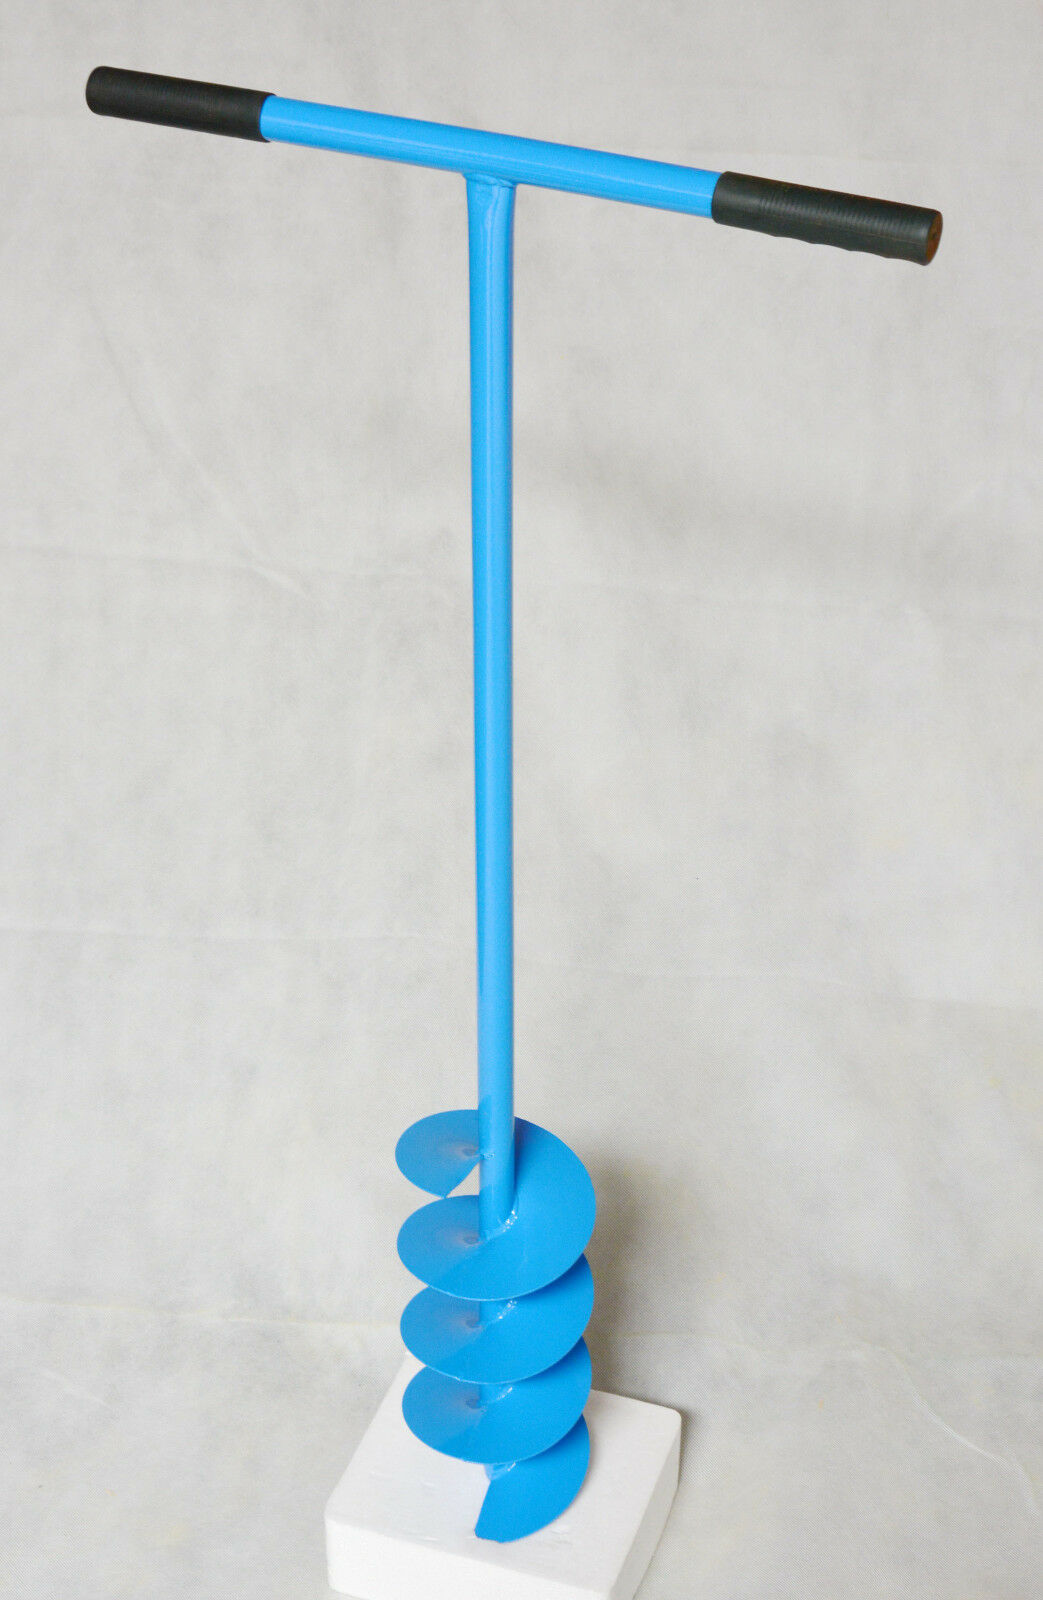 250mm Erdlochbohrer Hand Gartengeräte bohrer Pfahl Brunnenbohrgerät Werkzeug